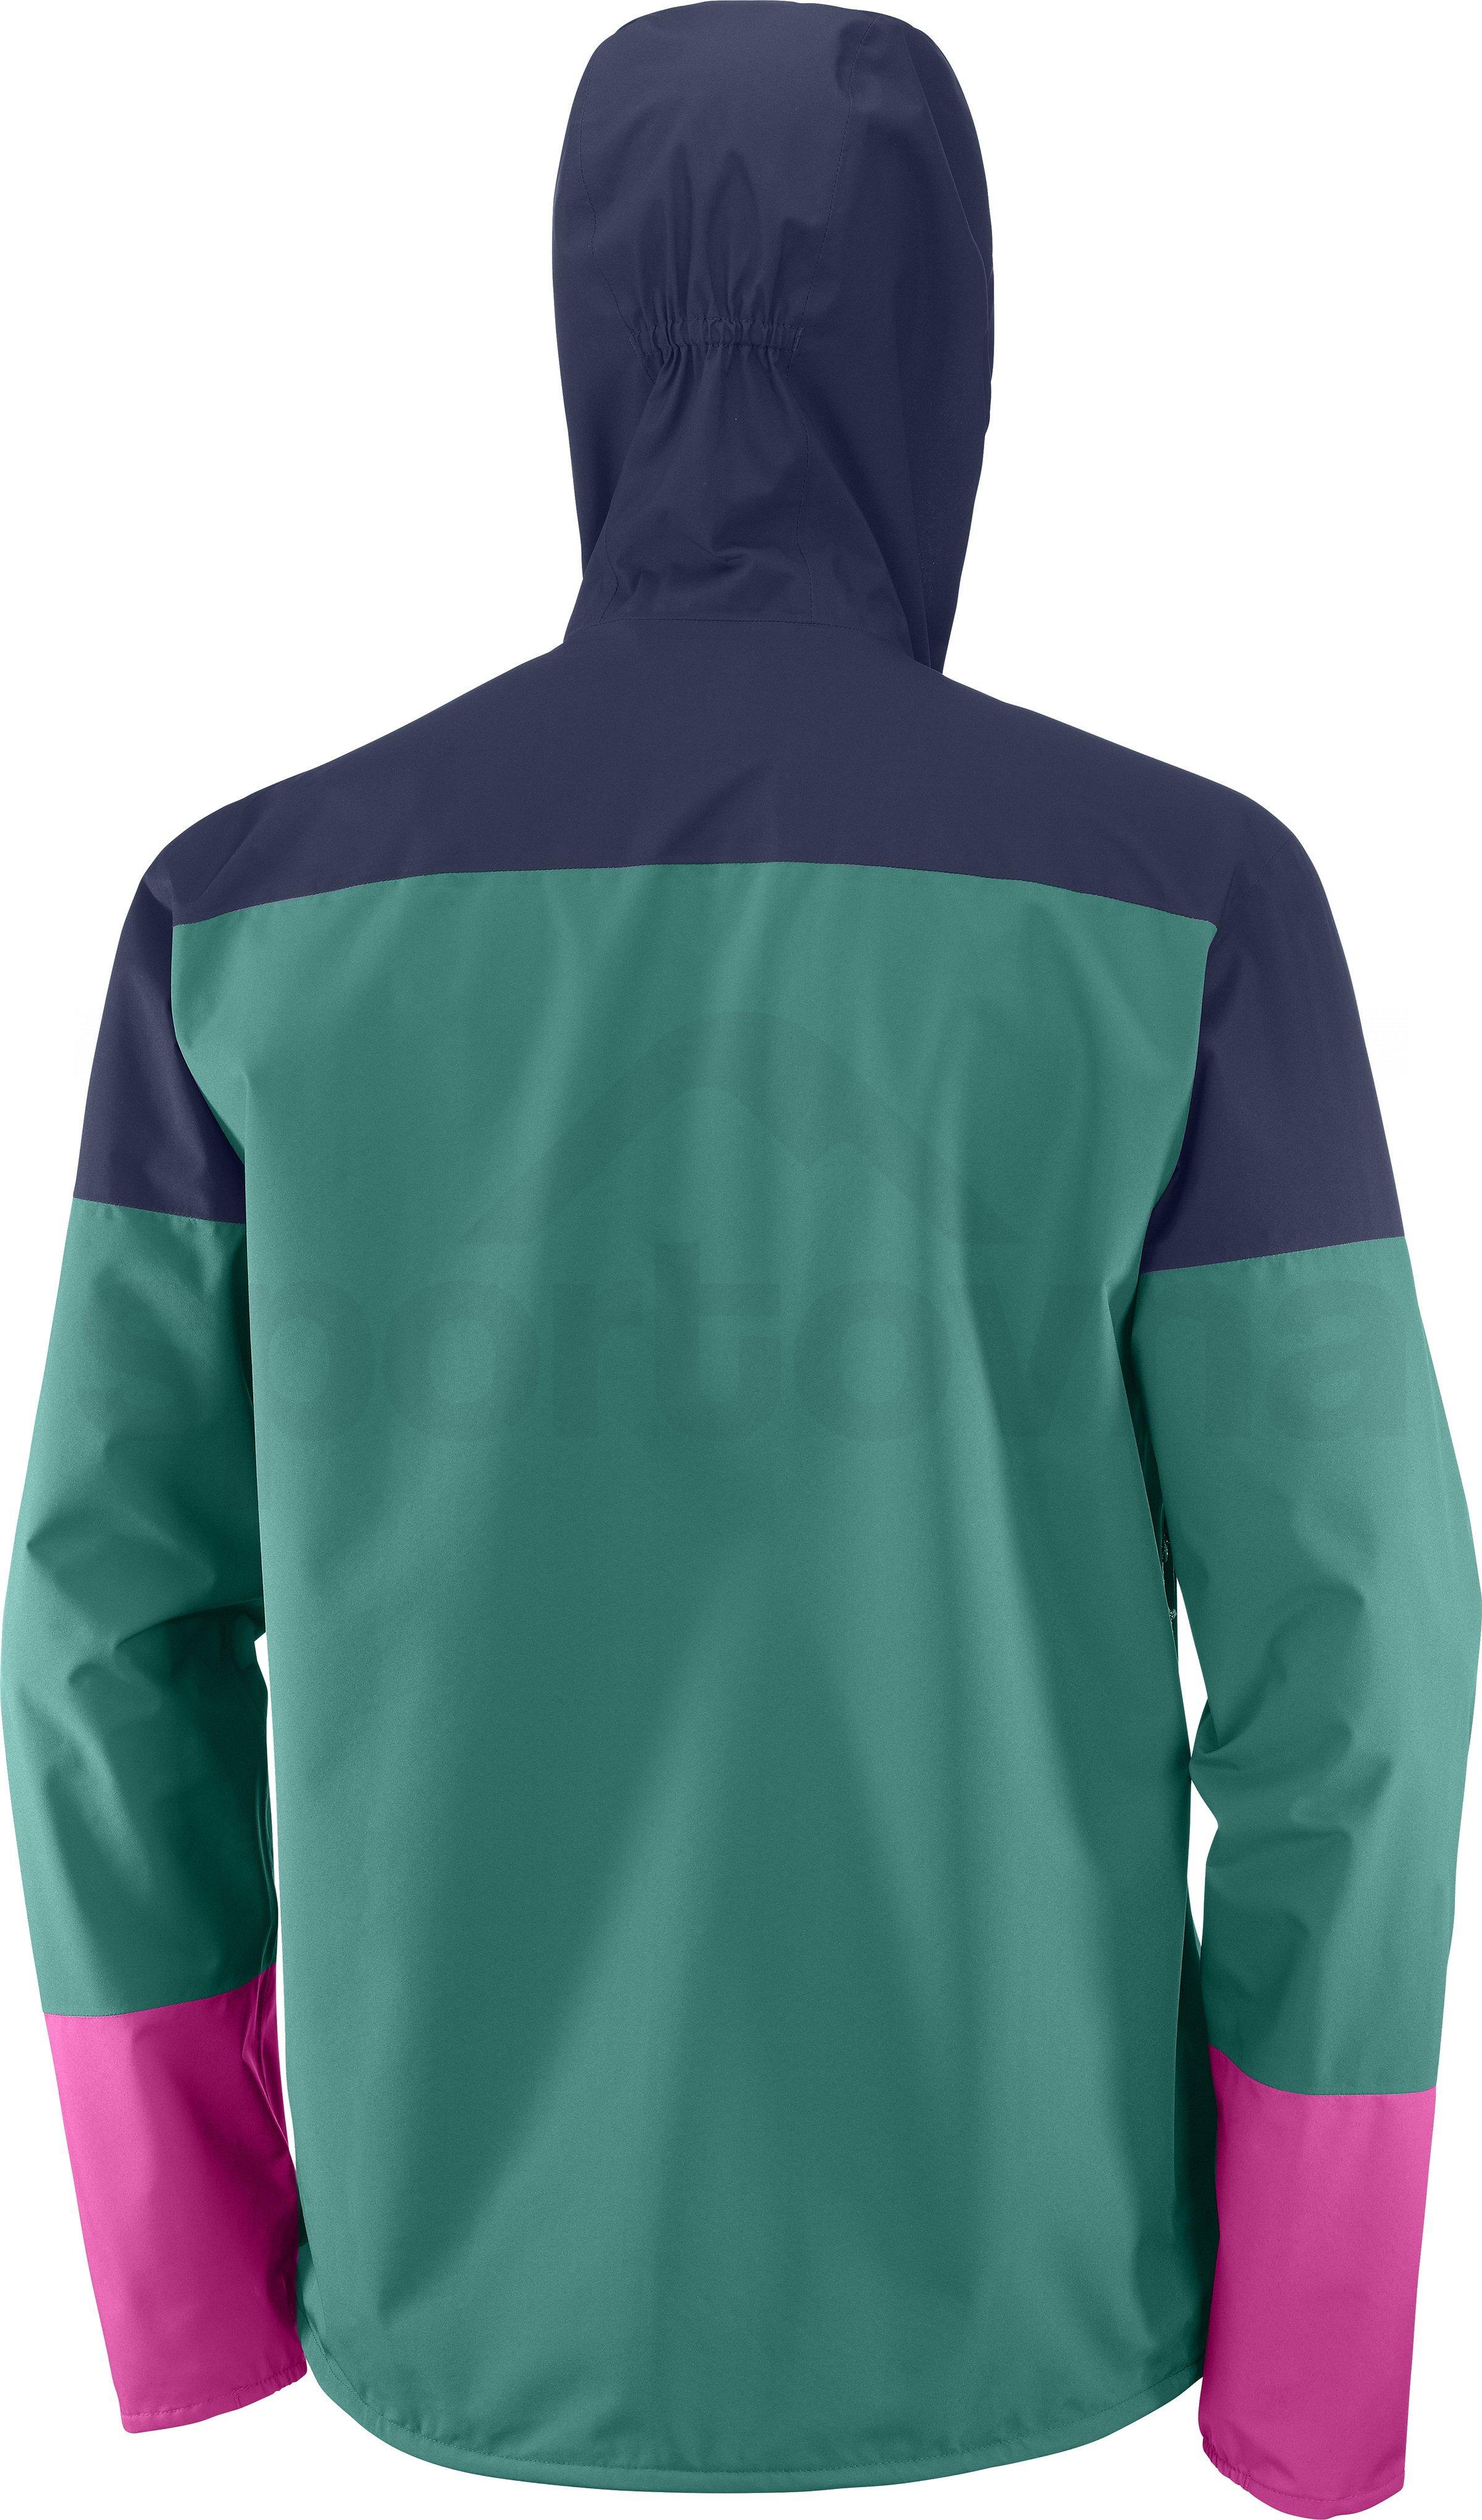 Bunda Salomon XA 2.5L Waterproof Jacket M - modrá/zelená